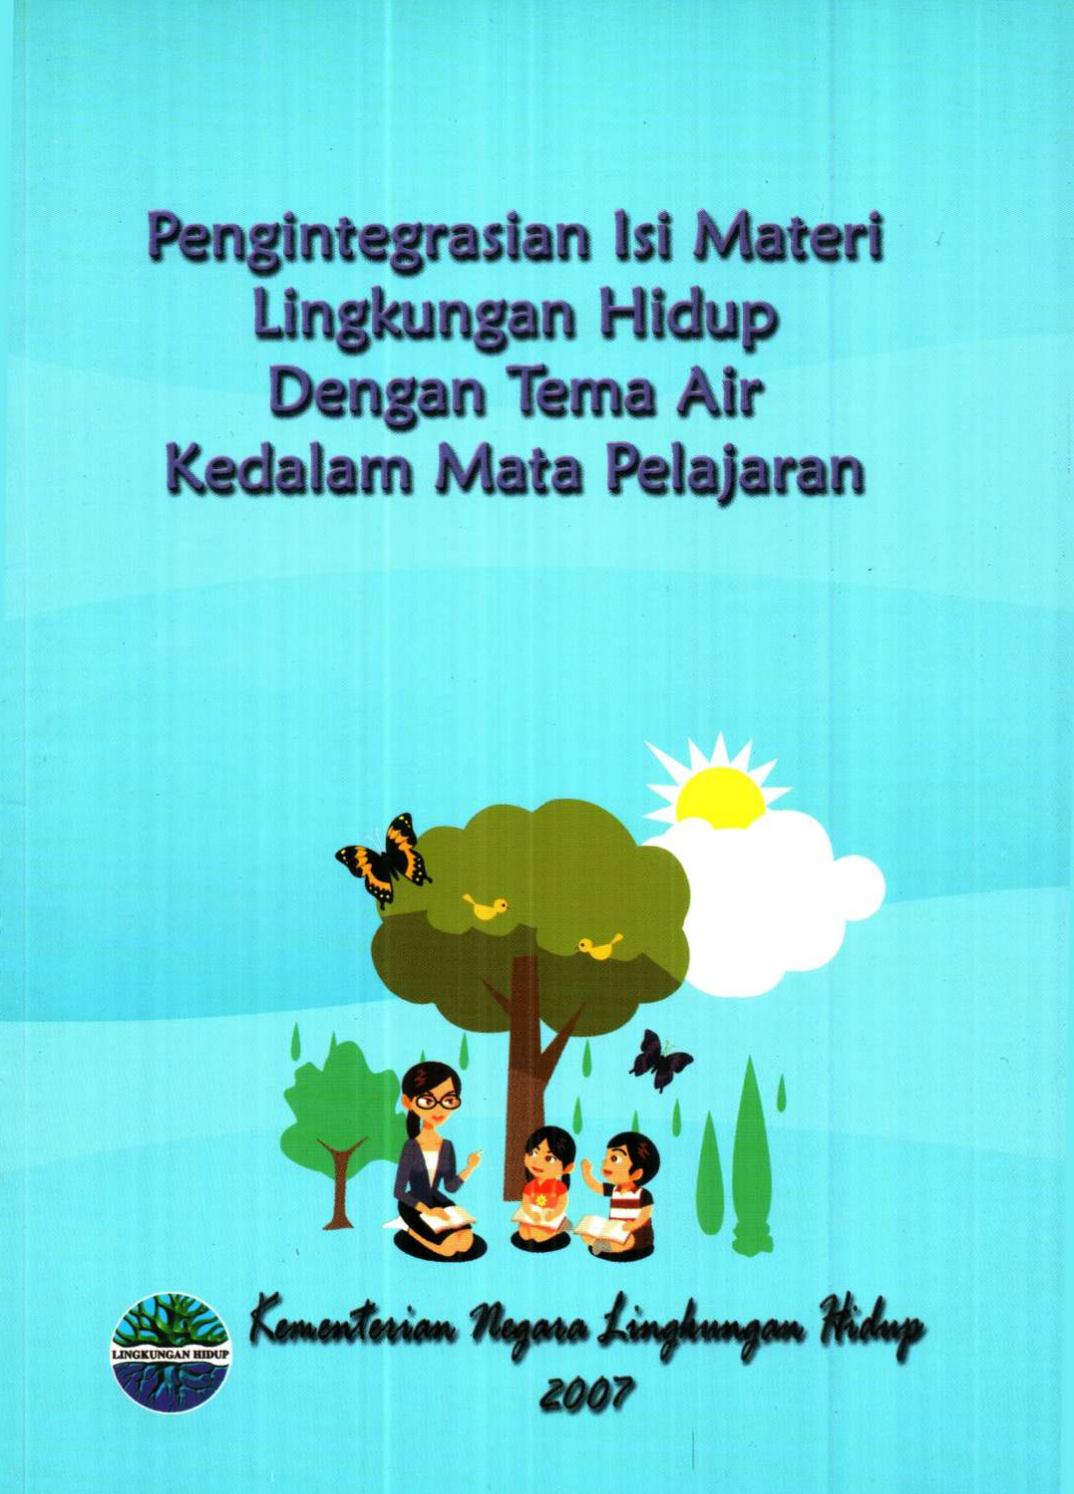 pengintegrasian isi materi lingkungan hidup dengan tema air by yayat rukhiyat issuu